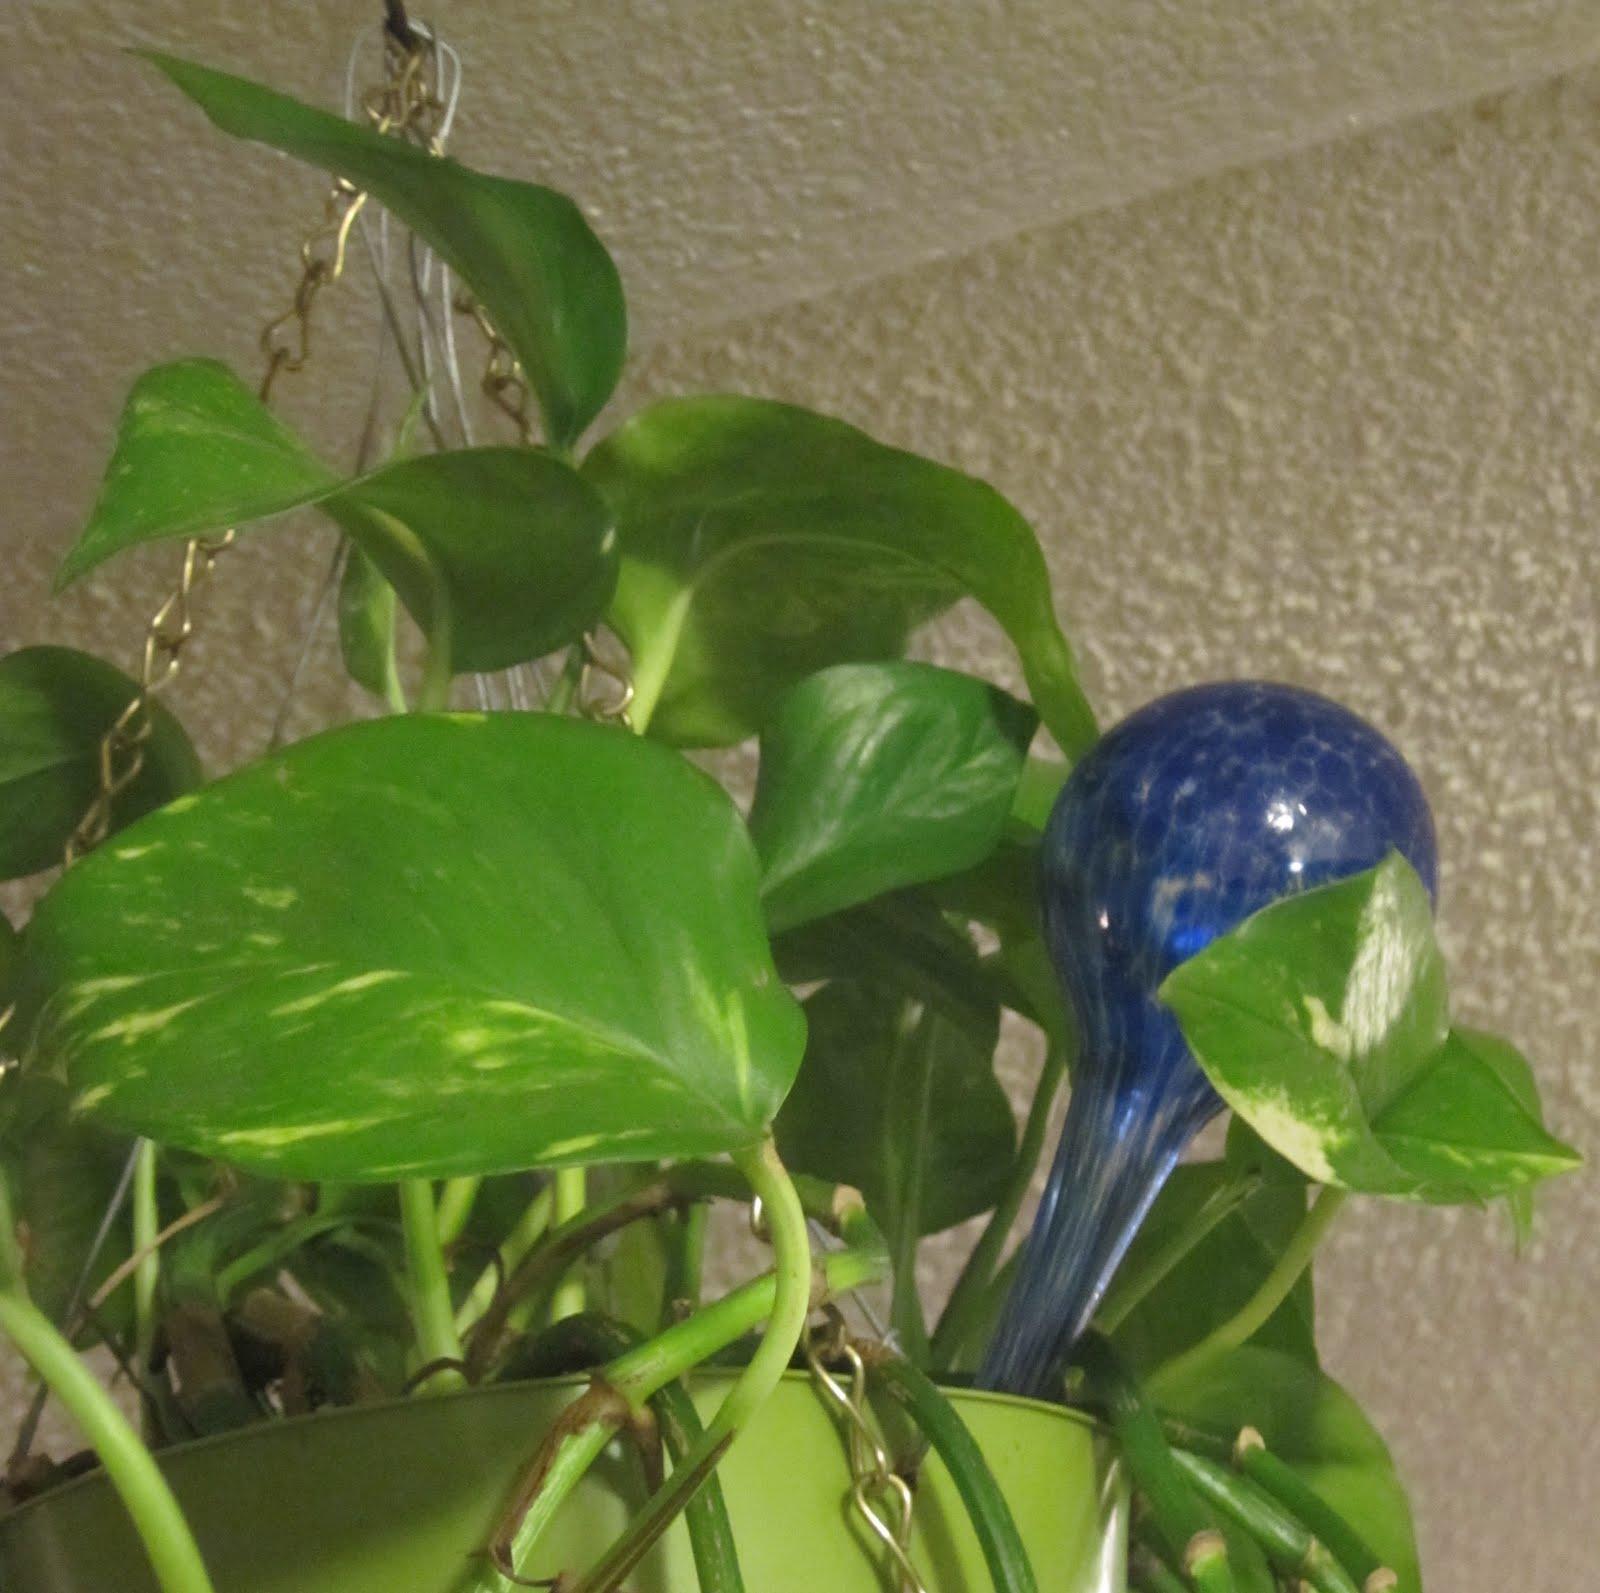 Urban Garden Deck: Aqua globes   rockin' the soil of house